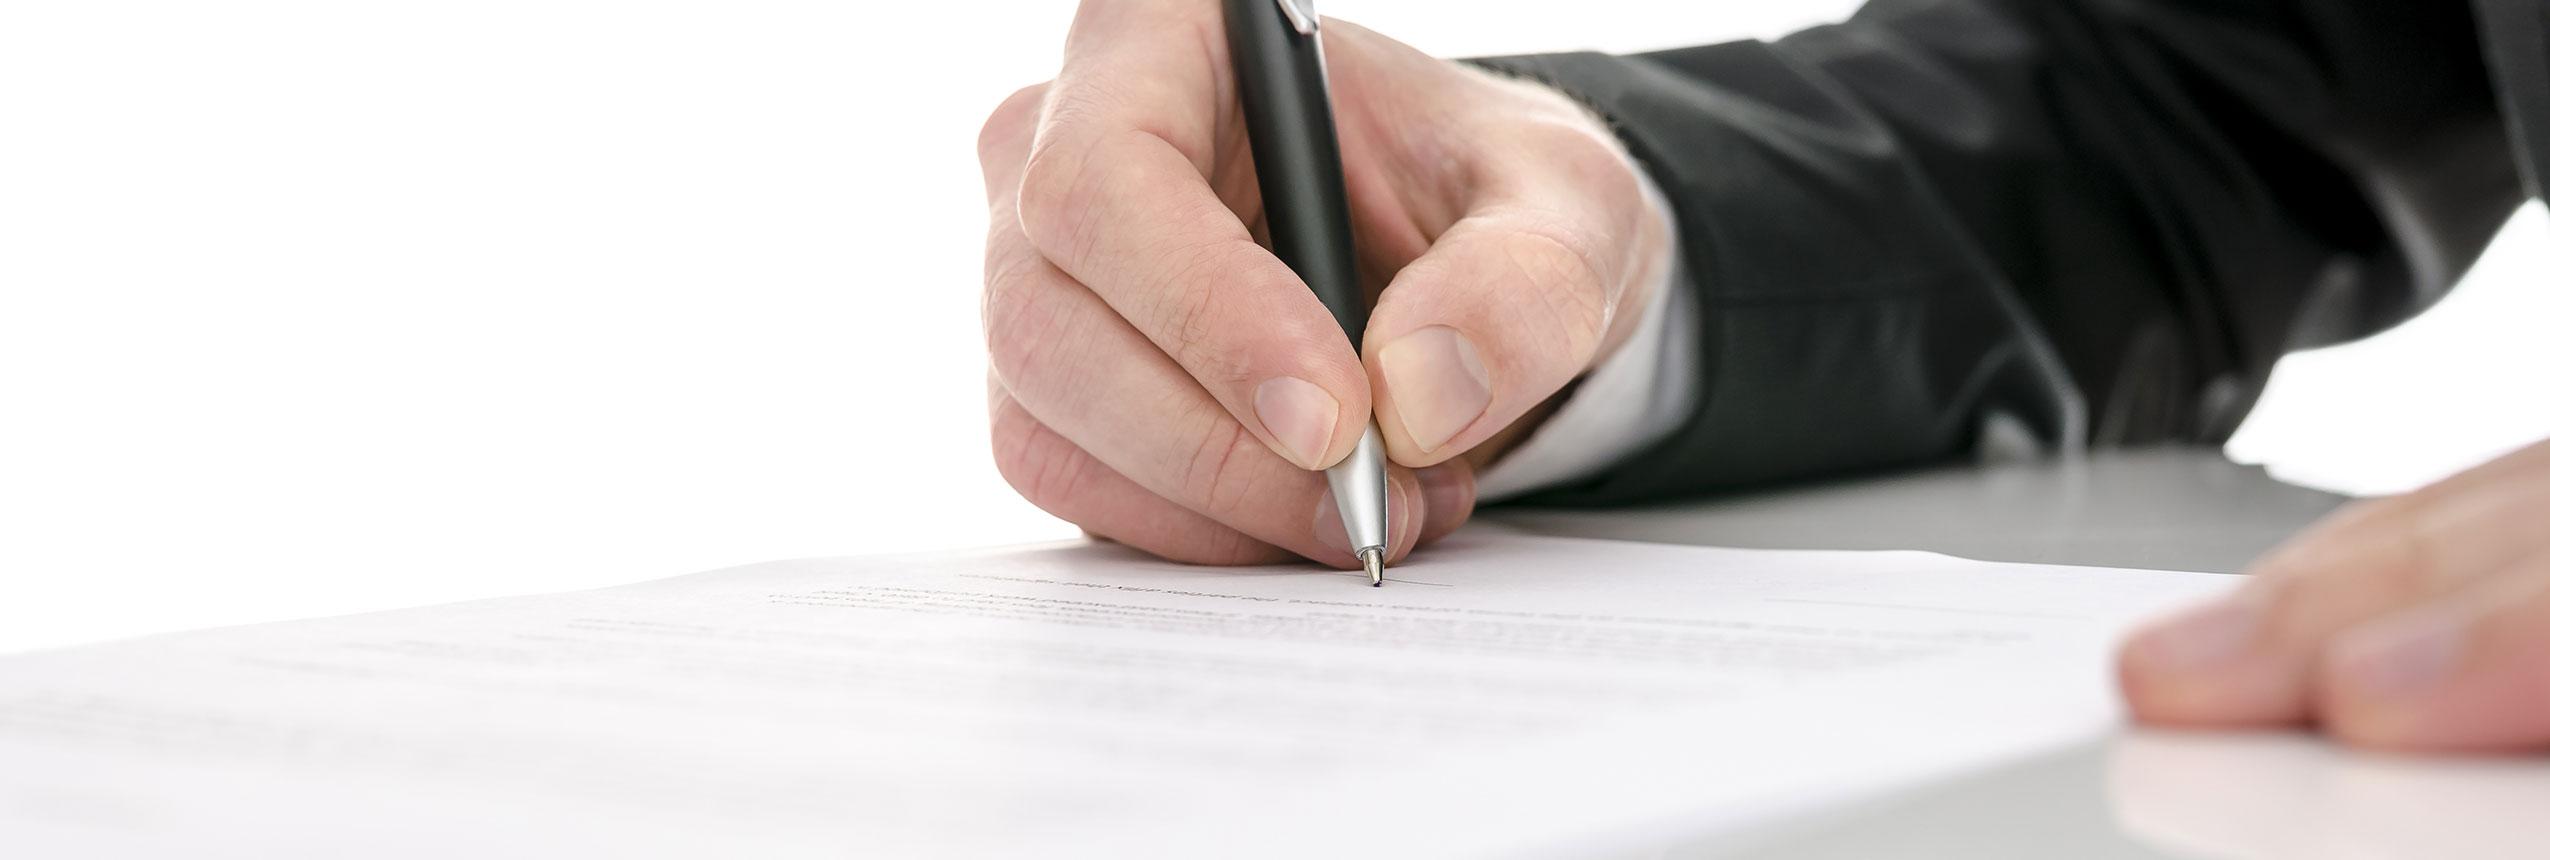 allgemeines vertragsrecht muenchen rechtsanwalt 1 - Vertragsrecht München